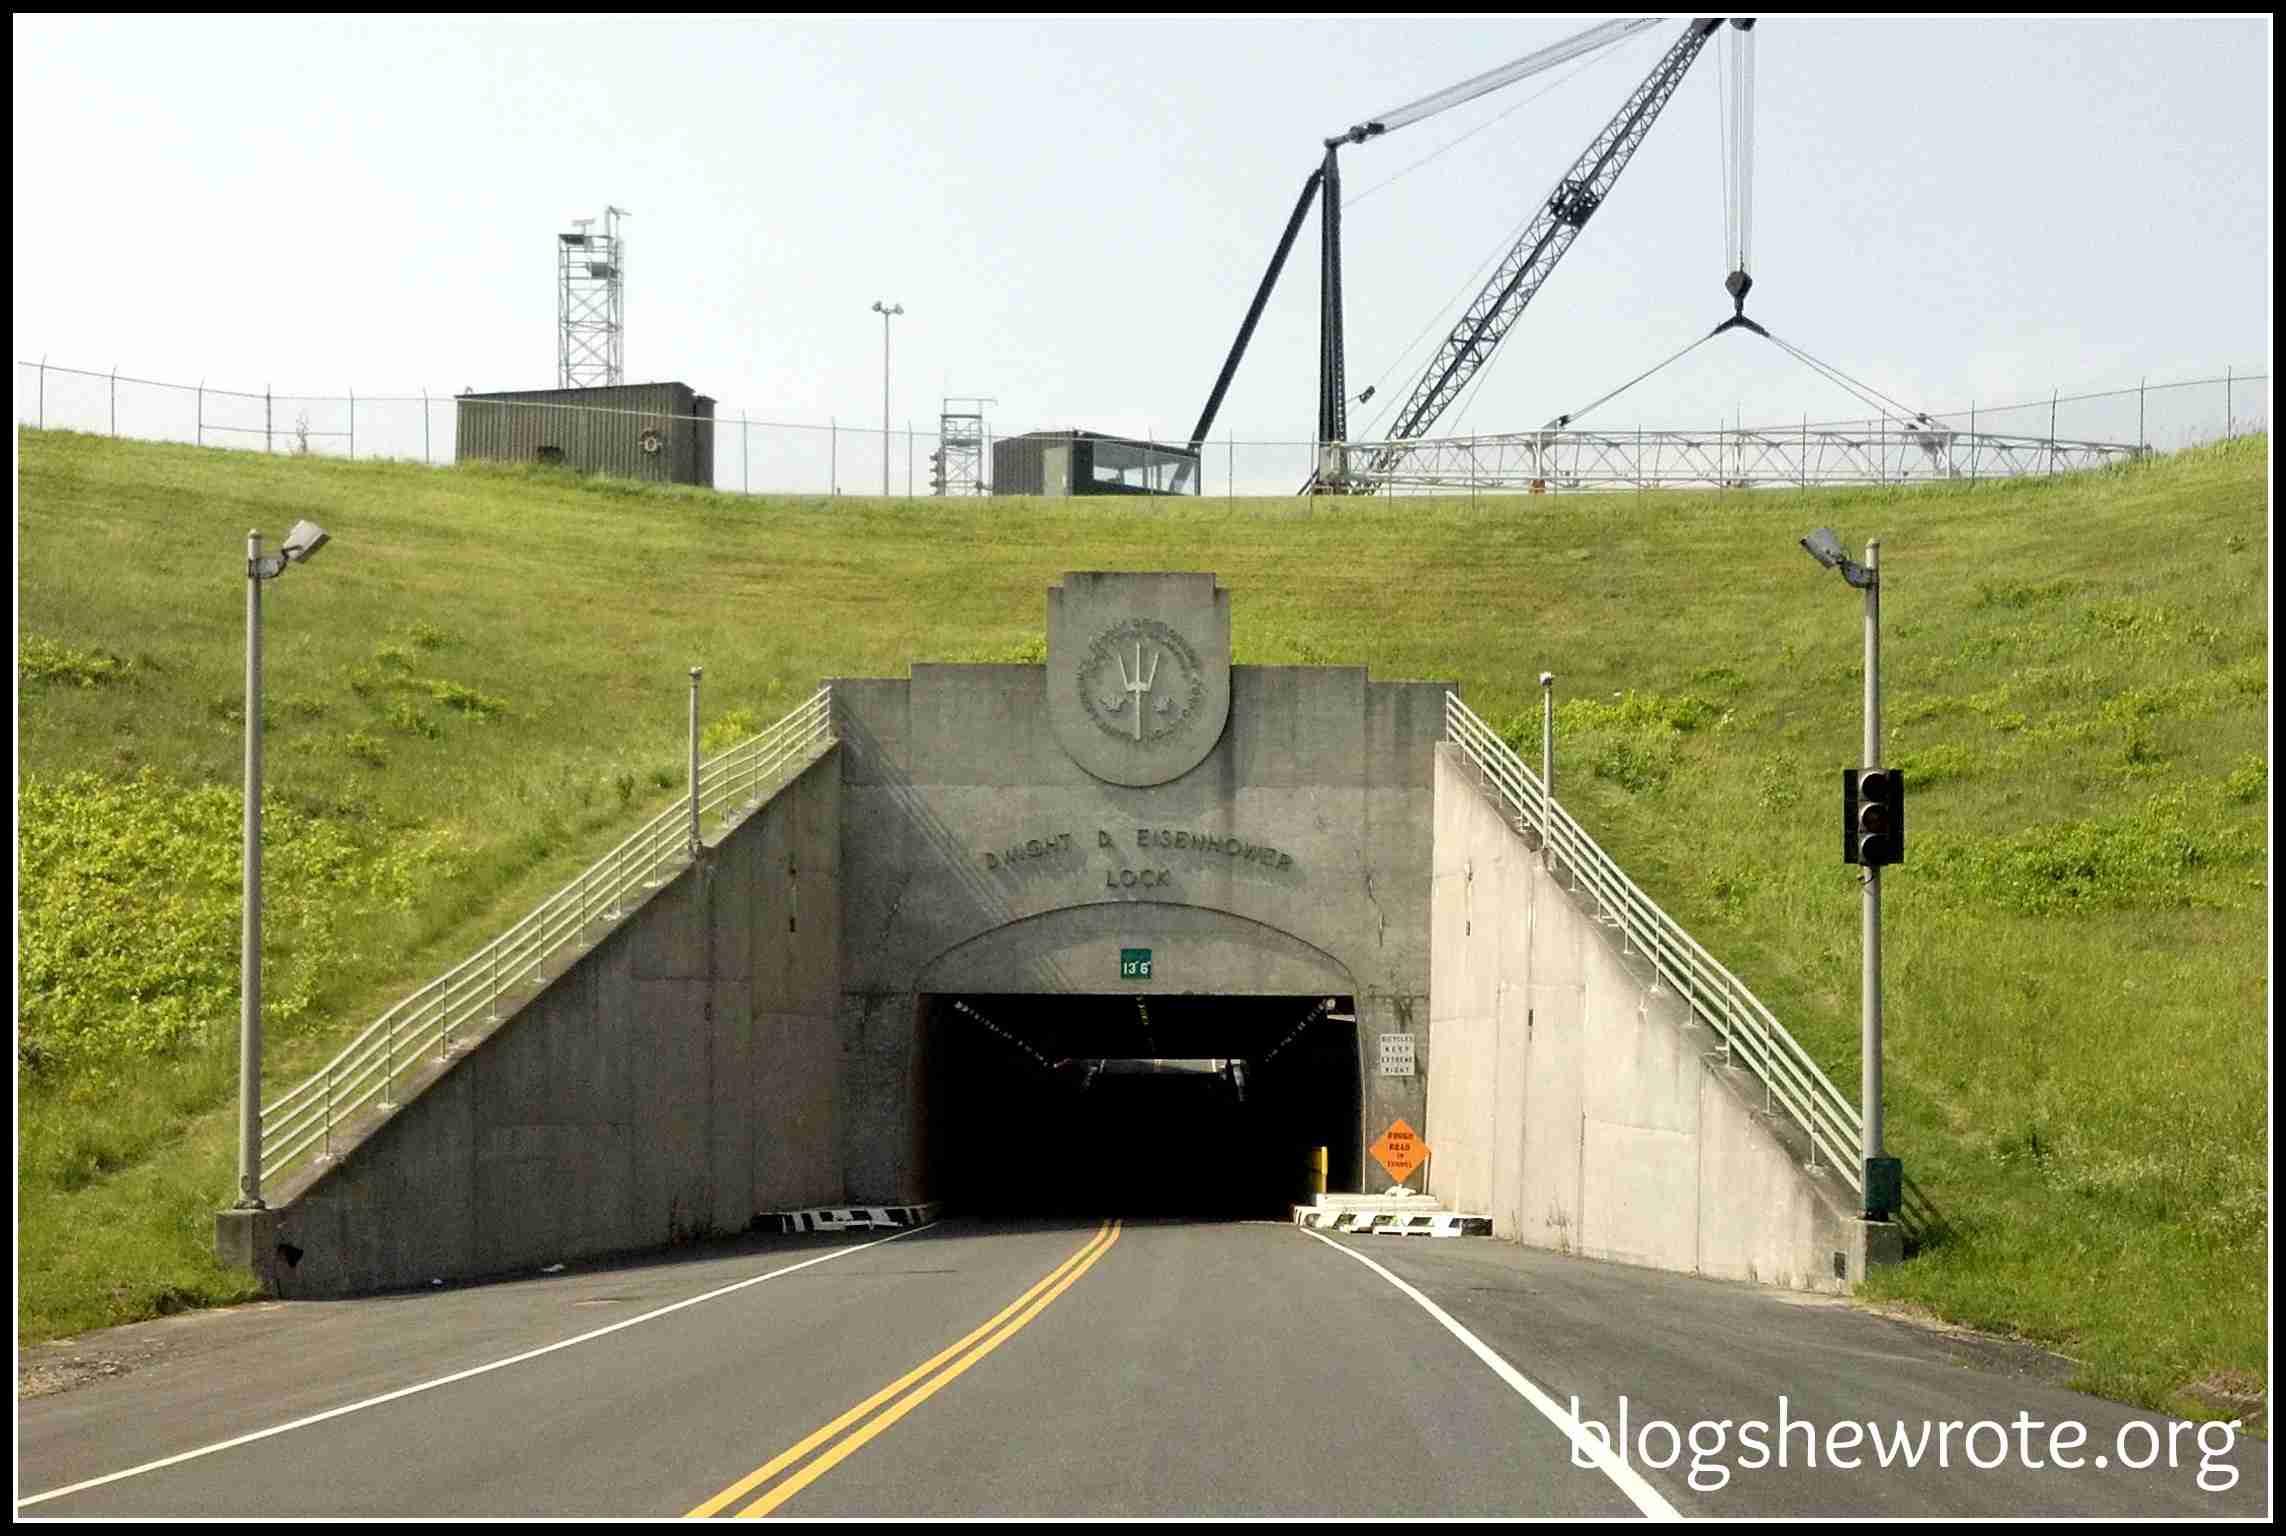 Eisenhower Lock